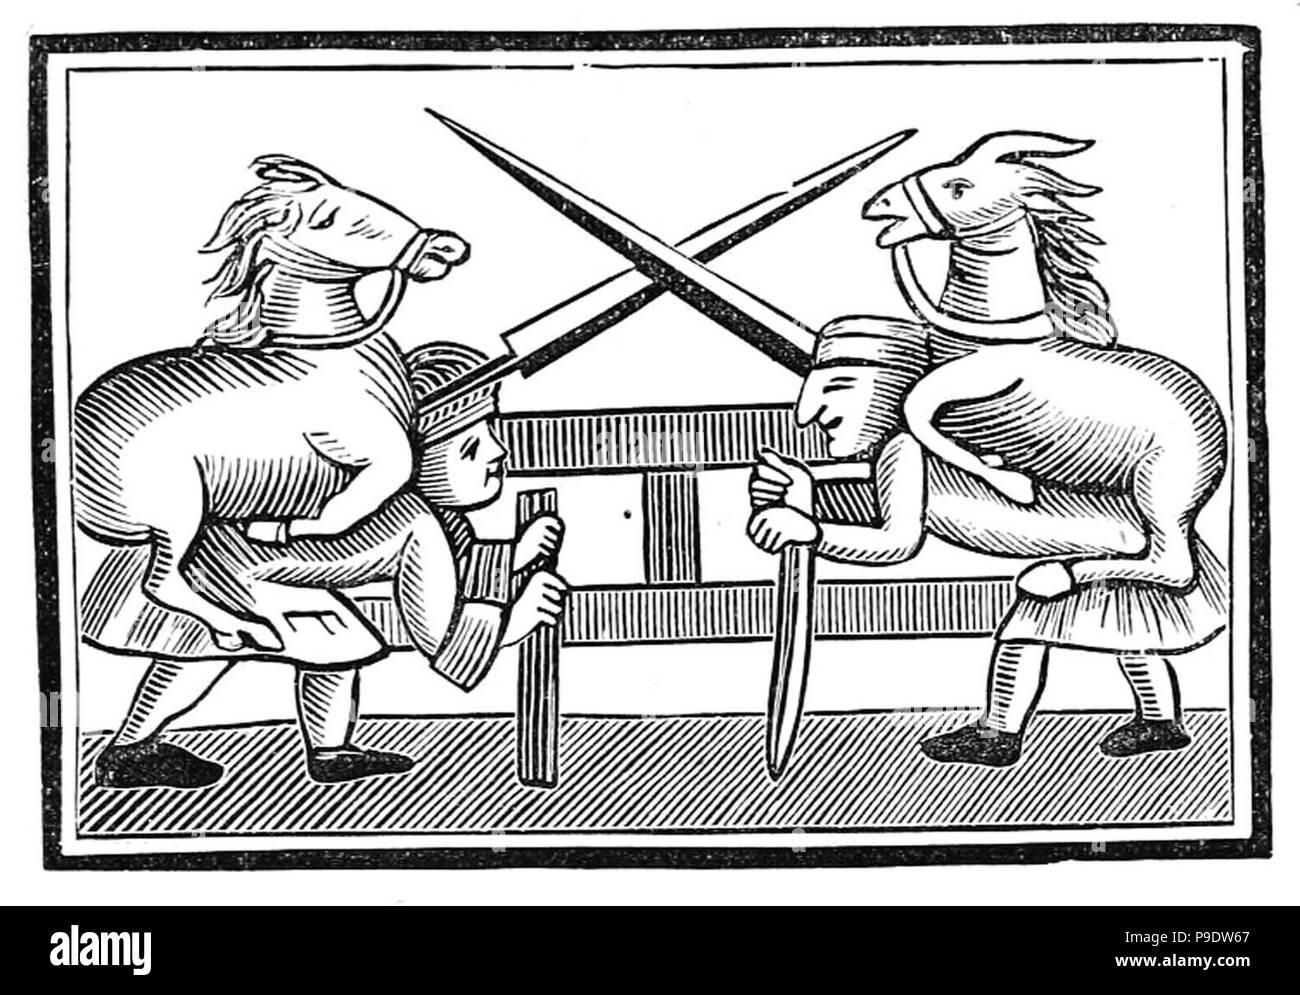 vintage woodcut illustration - Stock Image